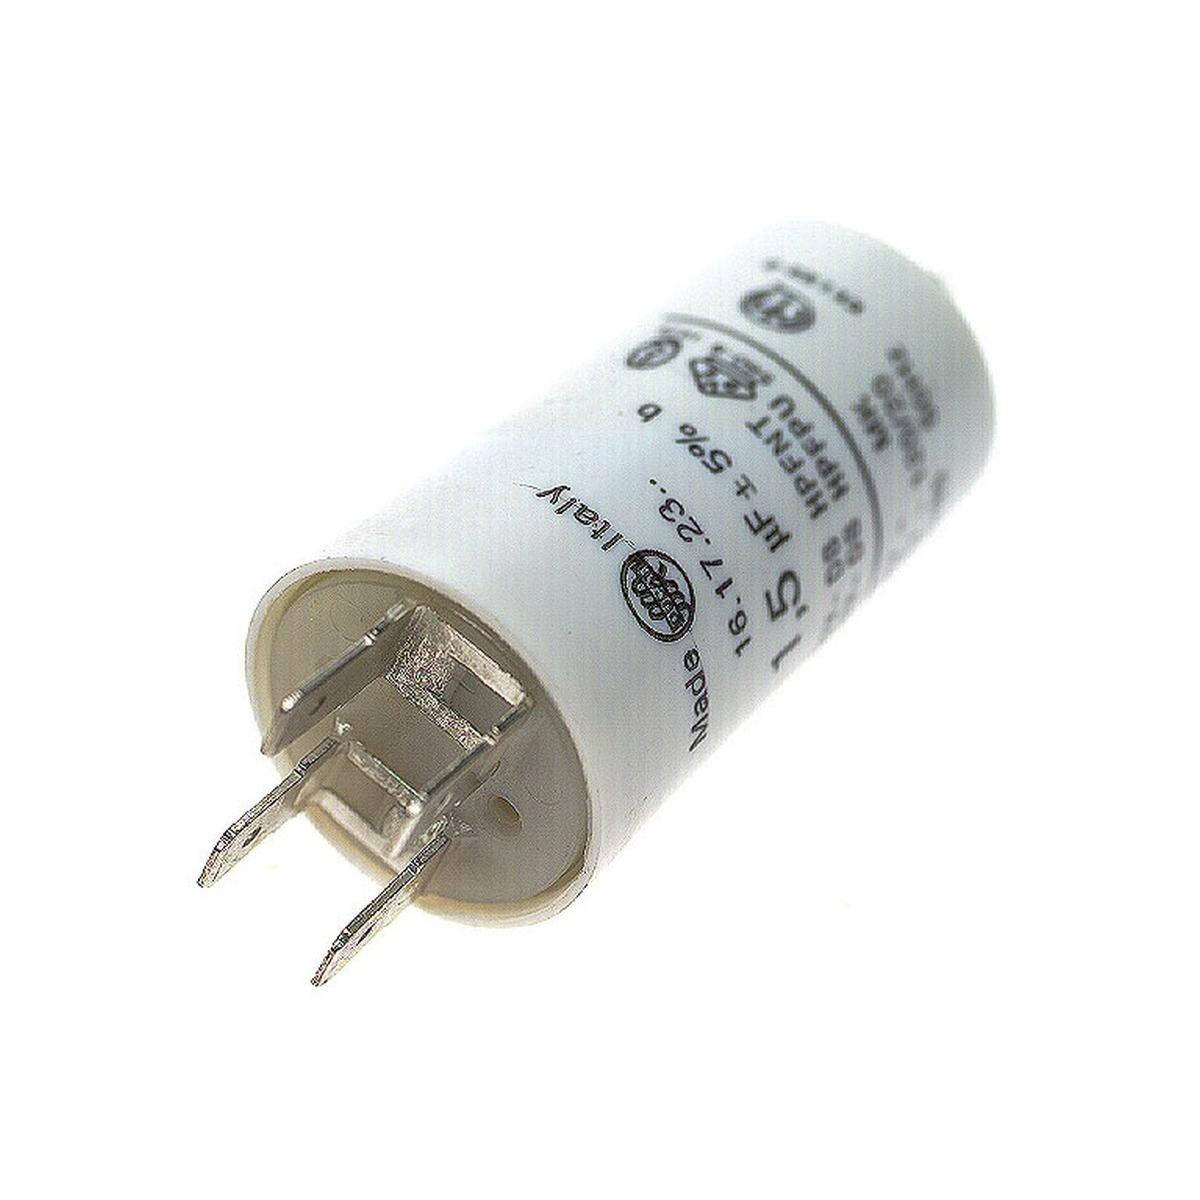 Kondensator 7,0 µF 450V